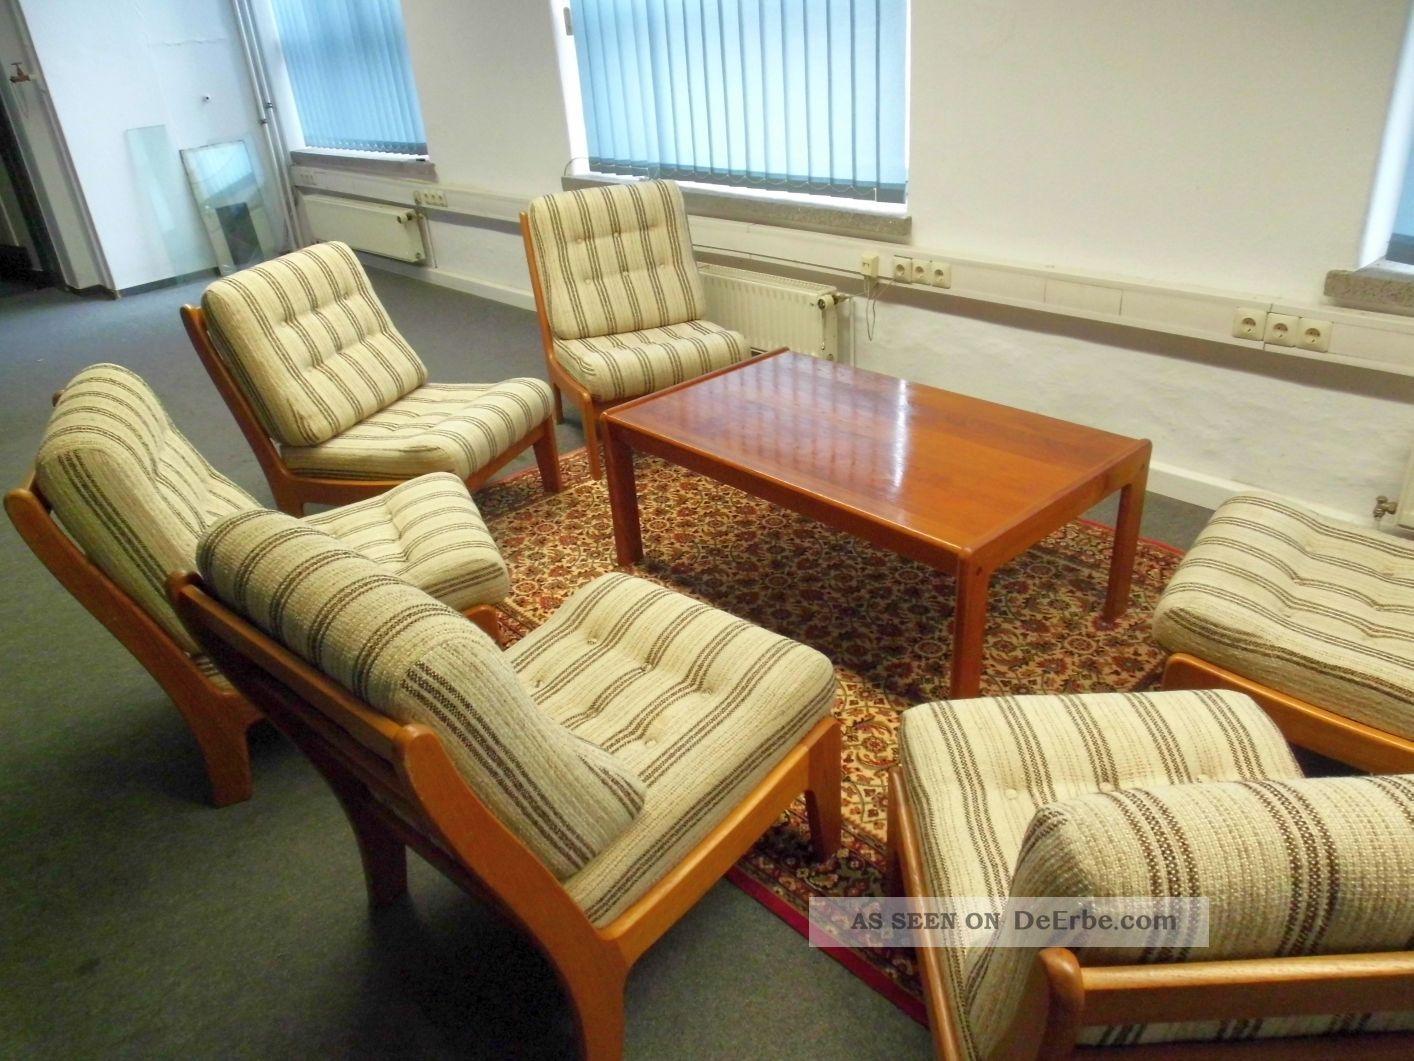 danish teak sesselelemente individuell stellbar sofa 70er 60s mid century. Black Bedroom Furniture Sets. Home Design Ideas